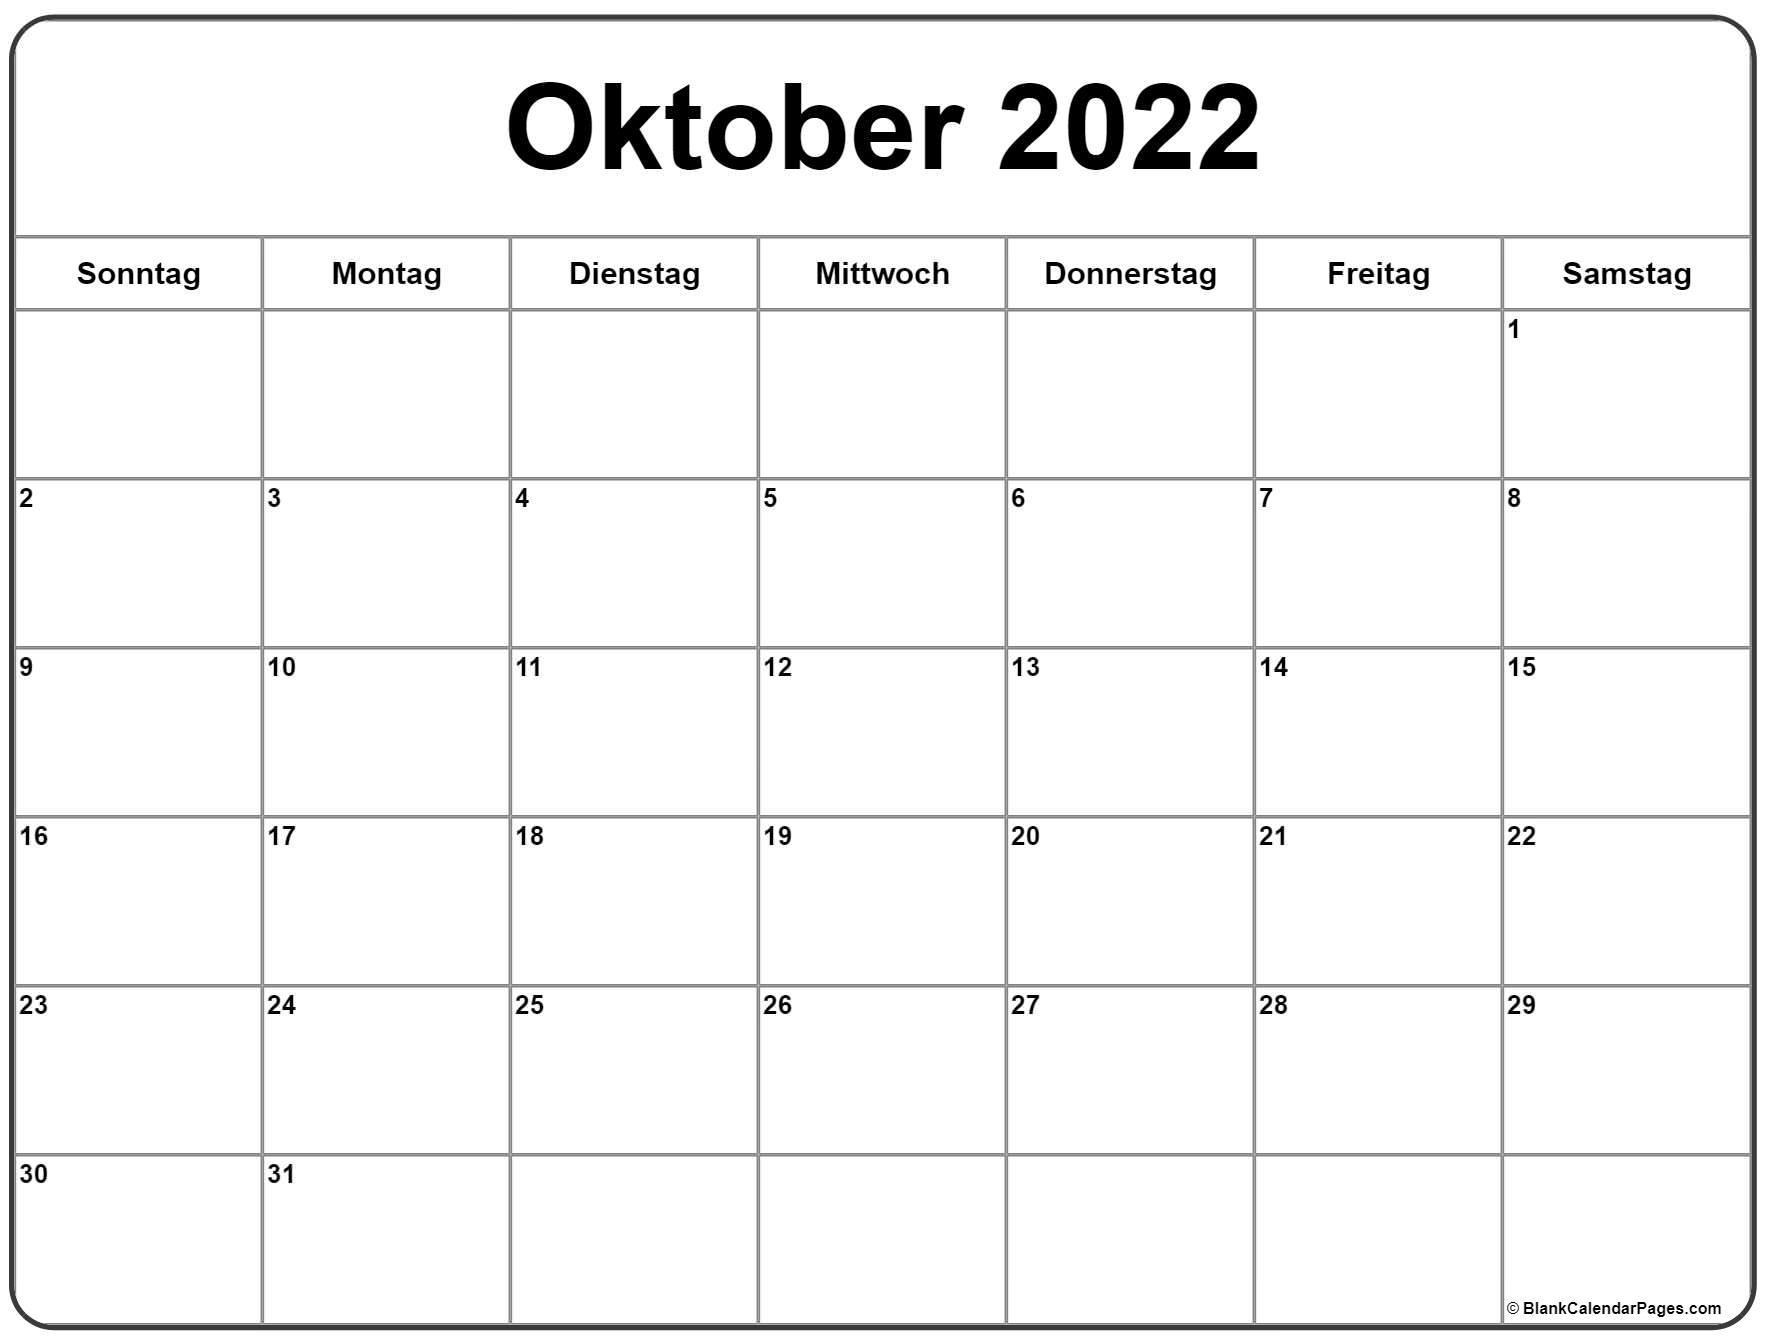 Oktober 2022 kalender